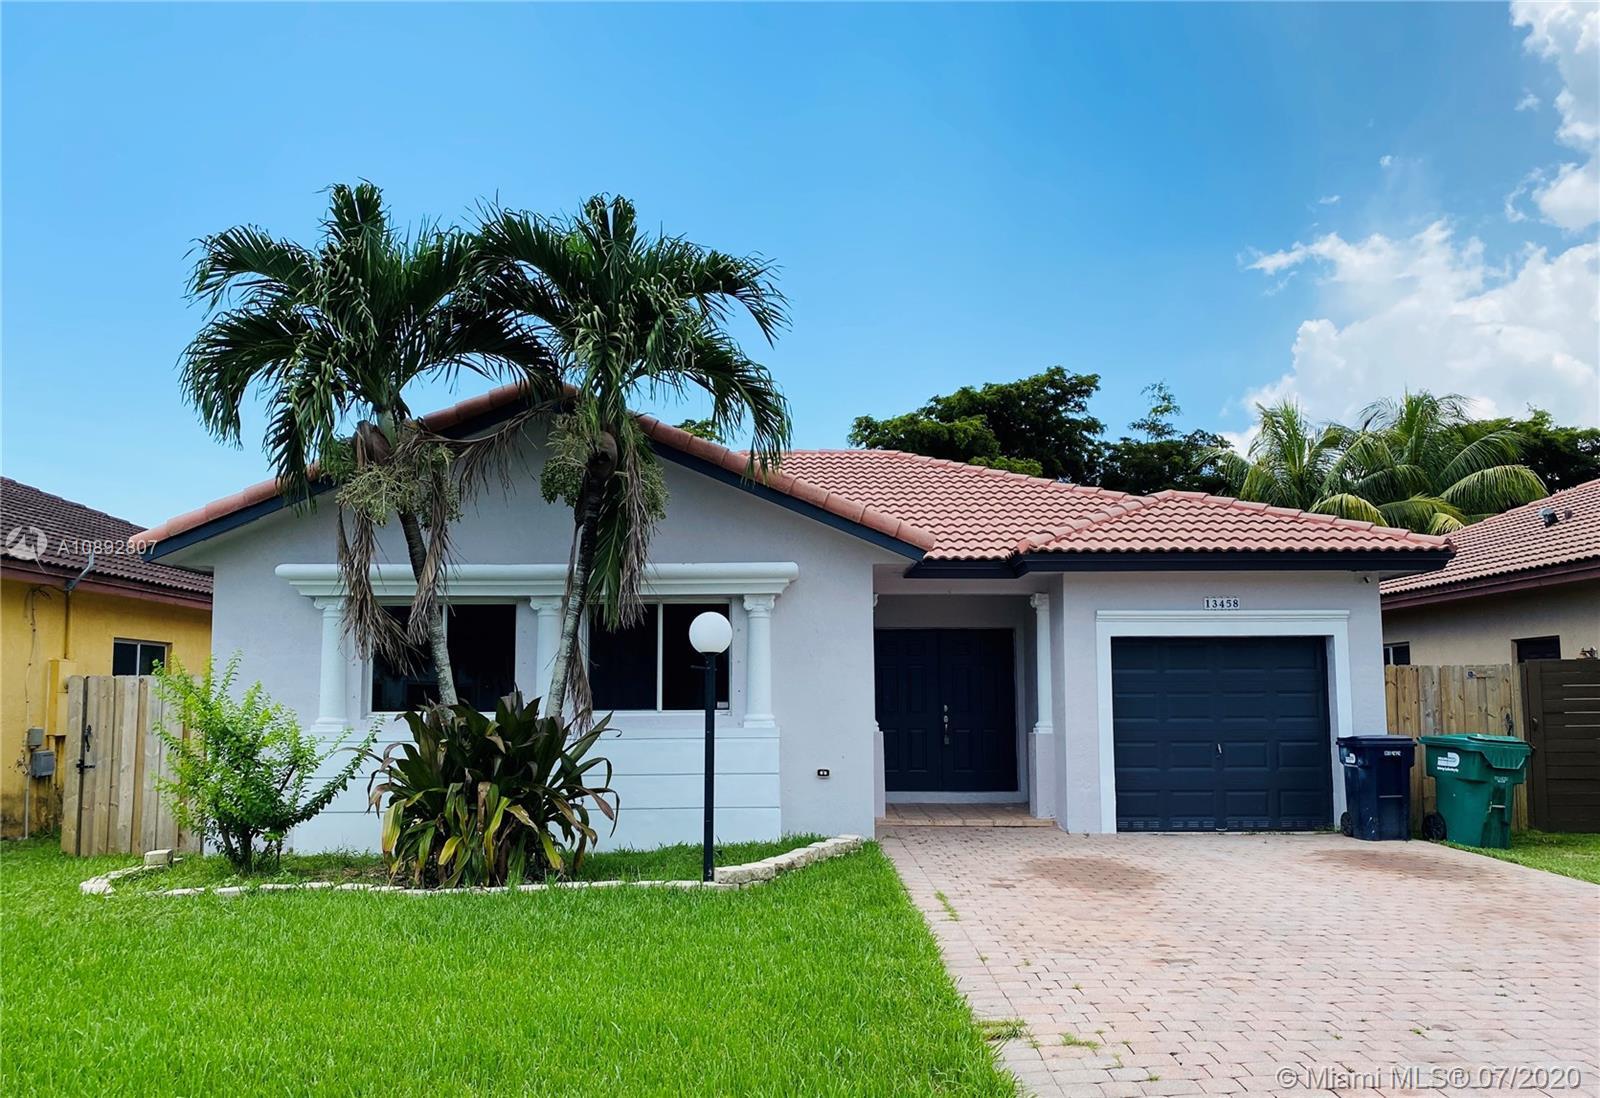 13458 SW 291st St Property Photo - Homestead, FL real estate listing